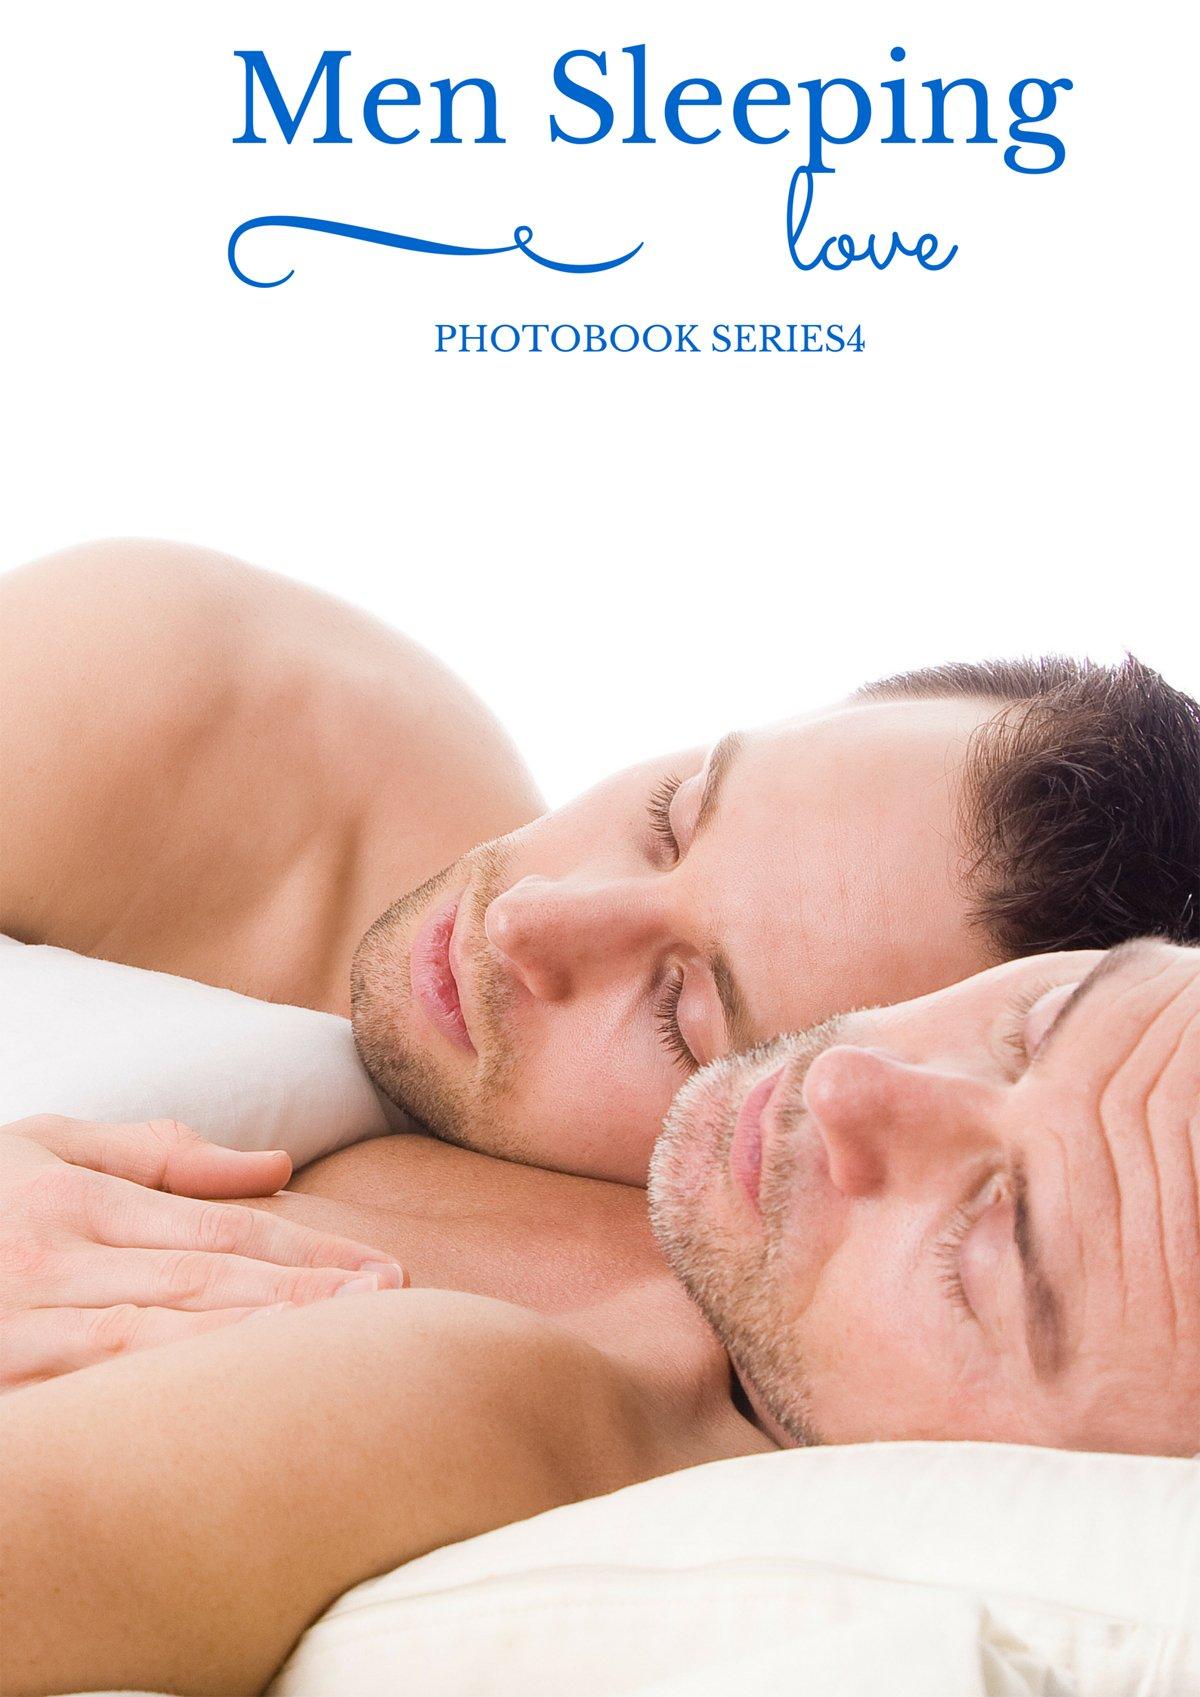 Men Sleeping (Photo Book) Series 4 por Missy Metta